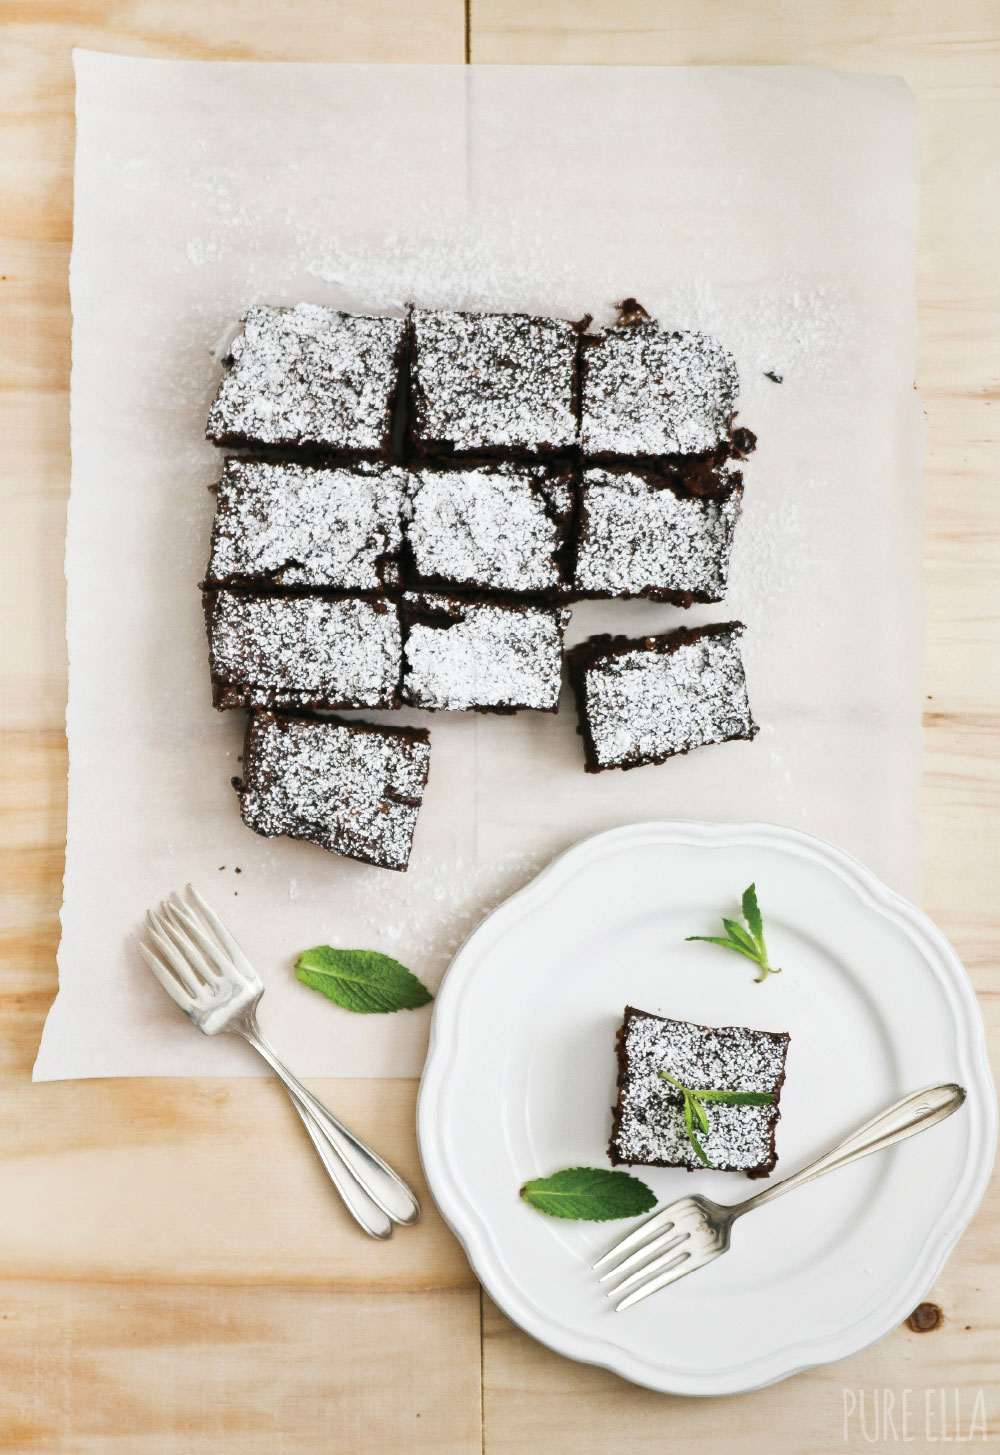 Pure-Ella-Guilt-free-Chocolate-Sweet-Potato-Brownies2